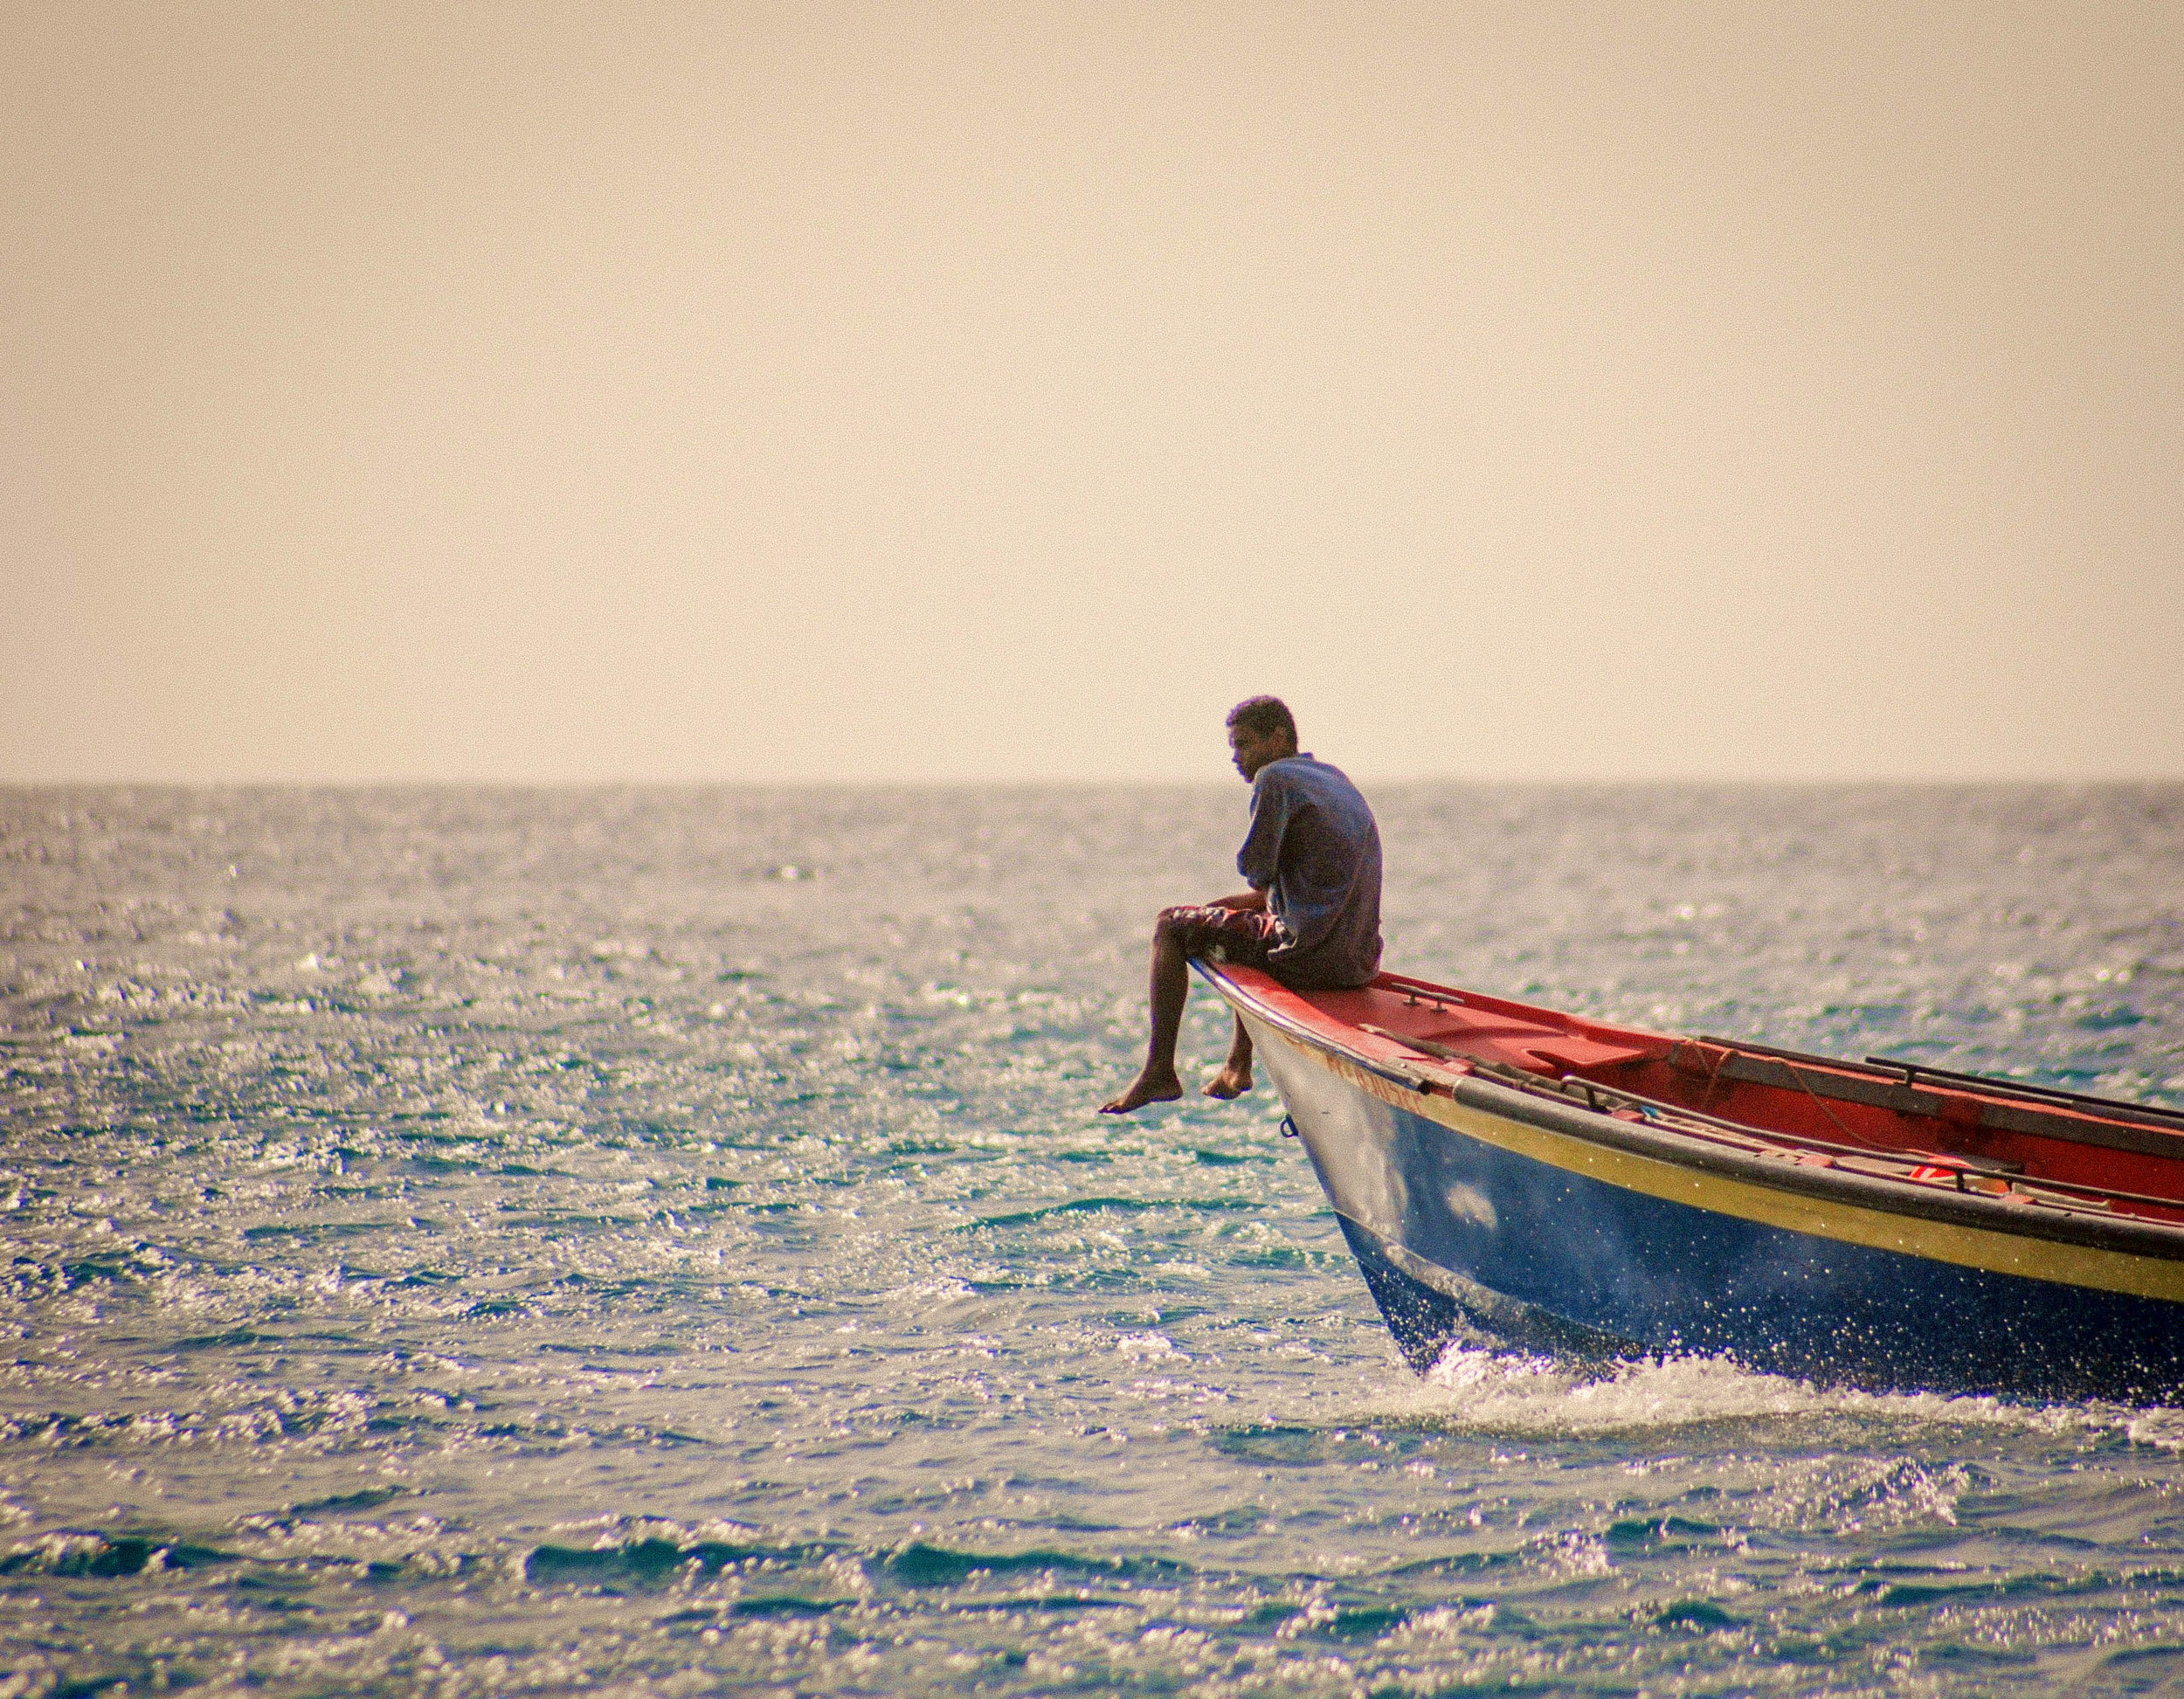 Fisherman North Madinina / Lifestyle